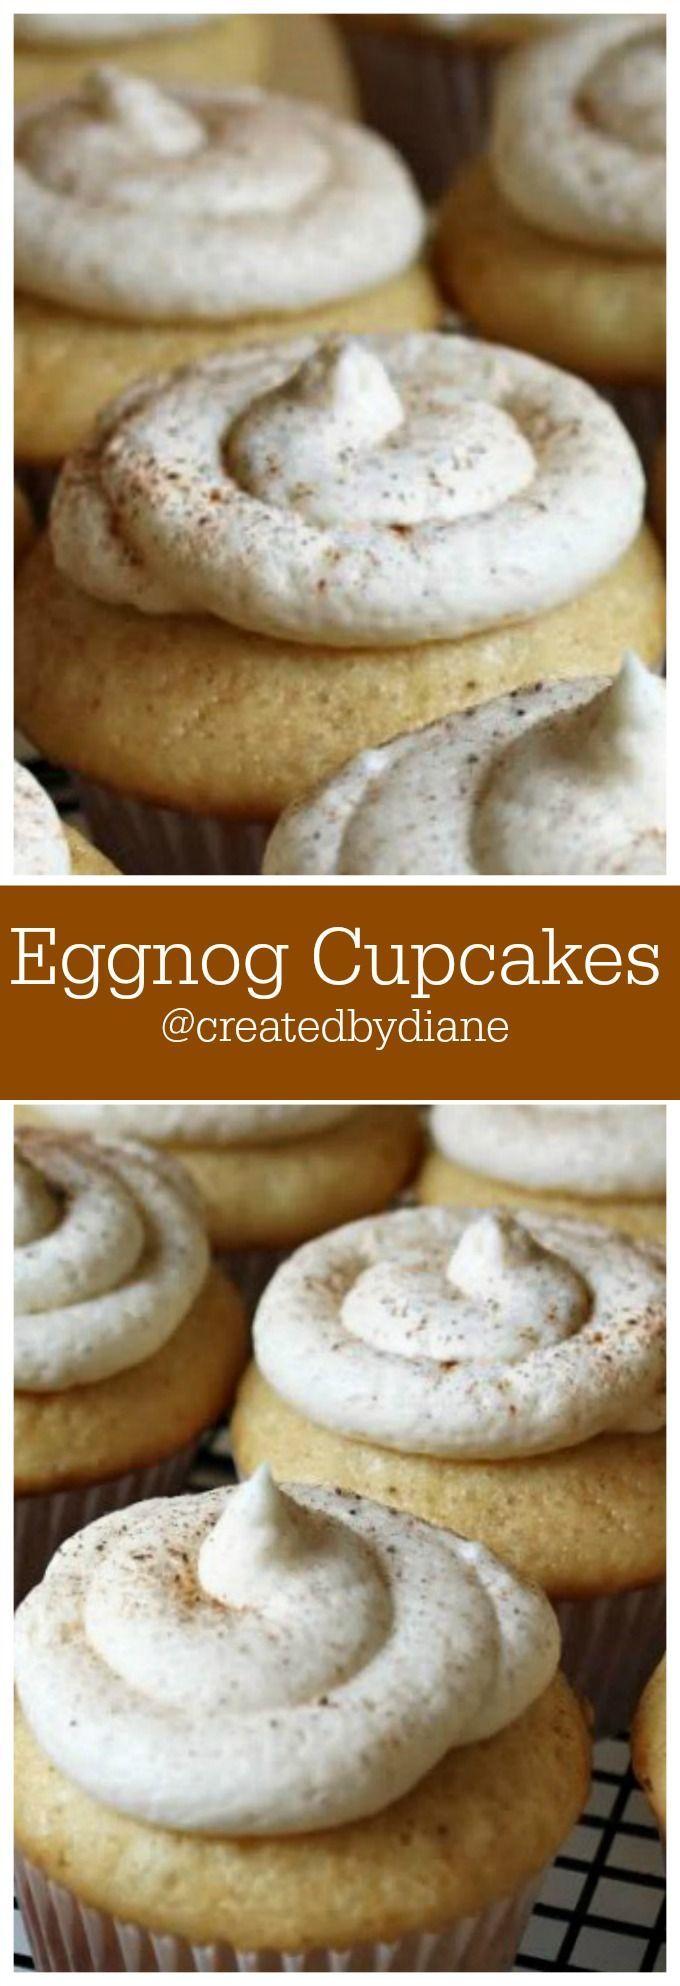 Eggnog Cupcakes /createdbydiane/